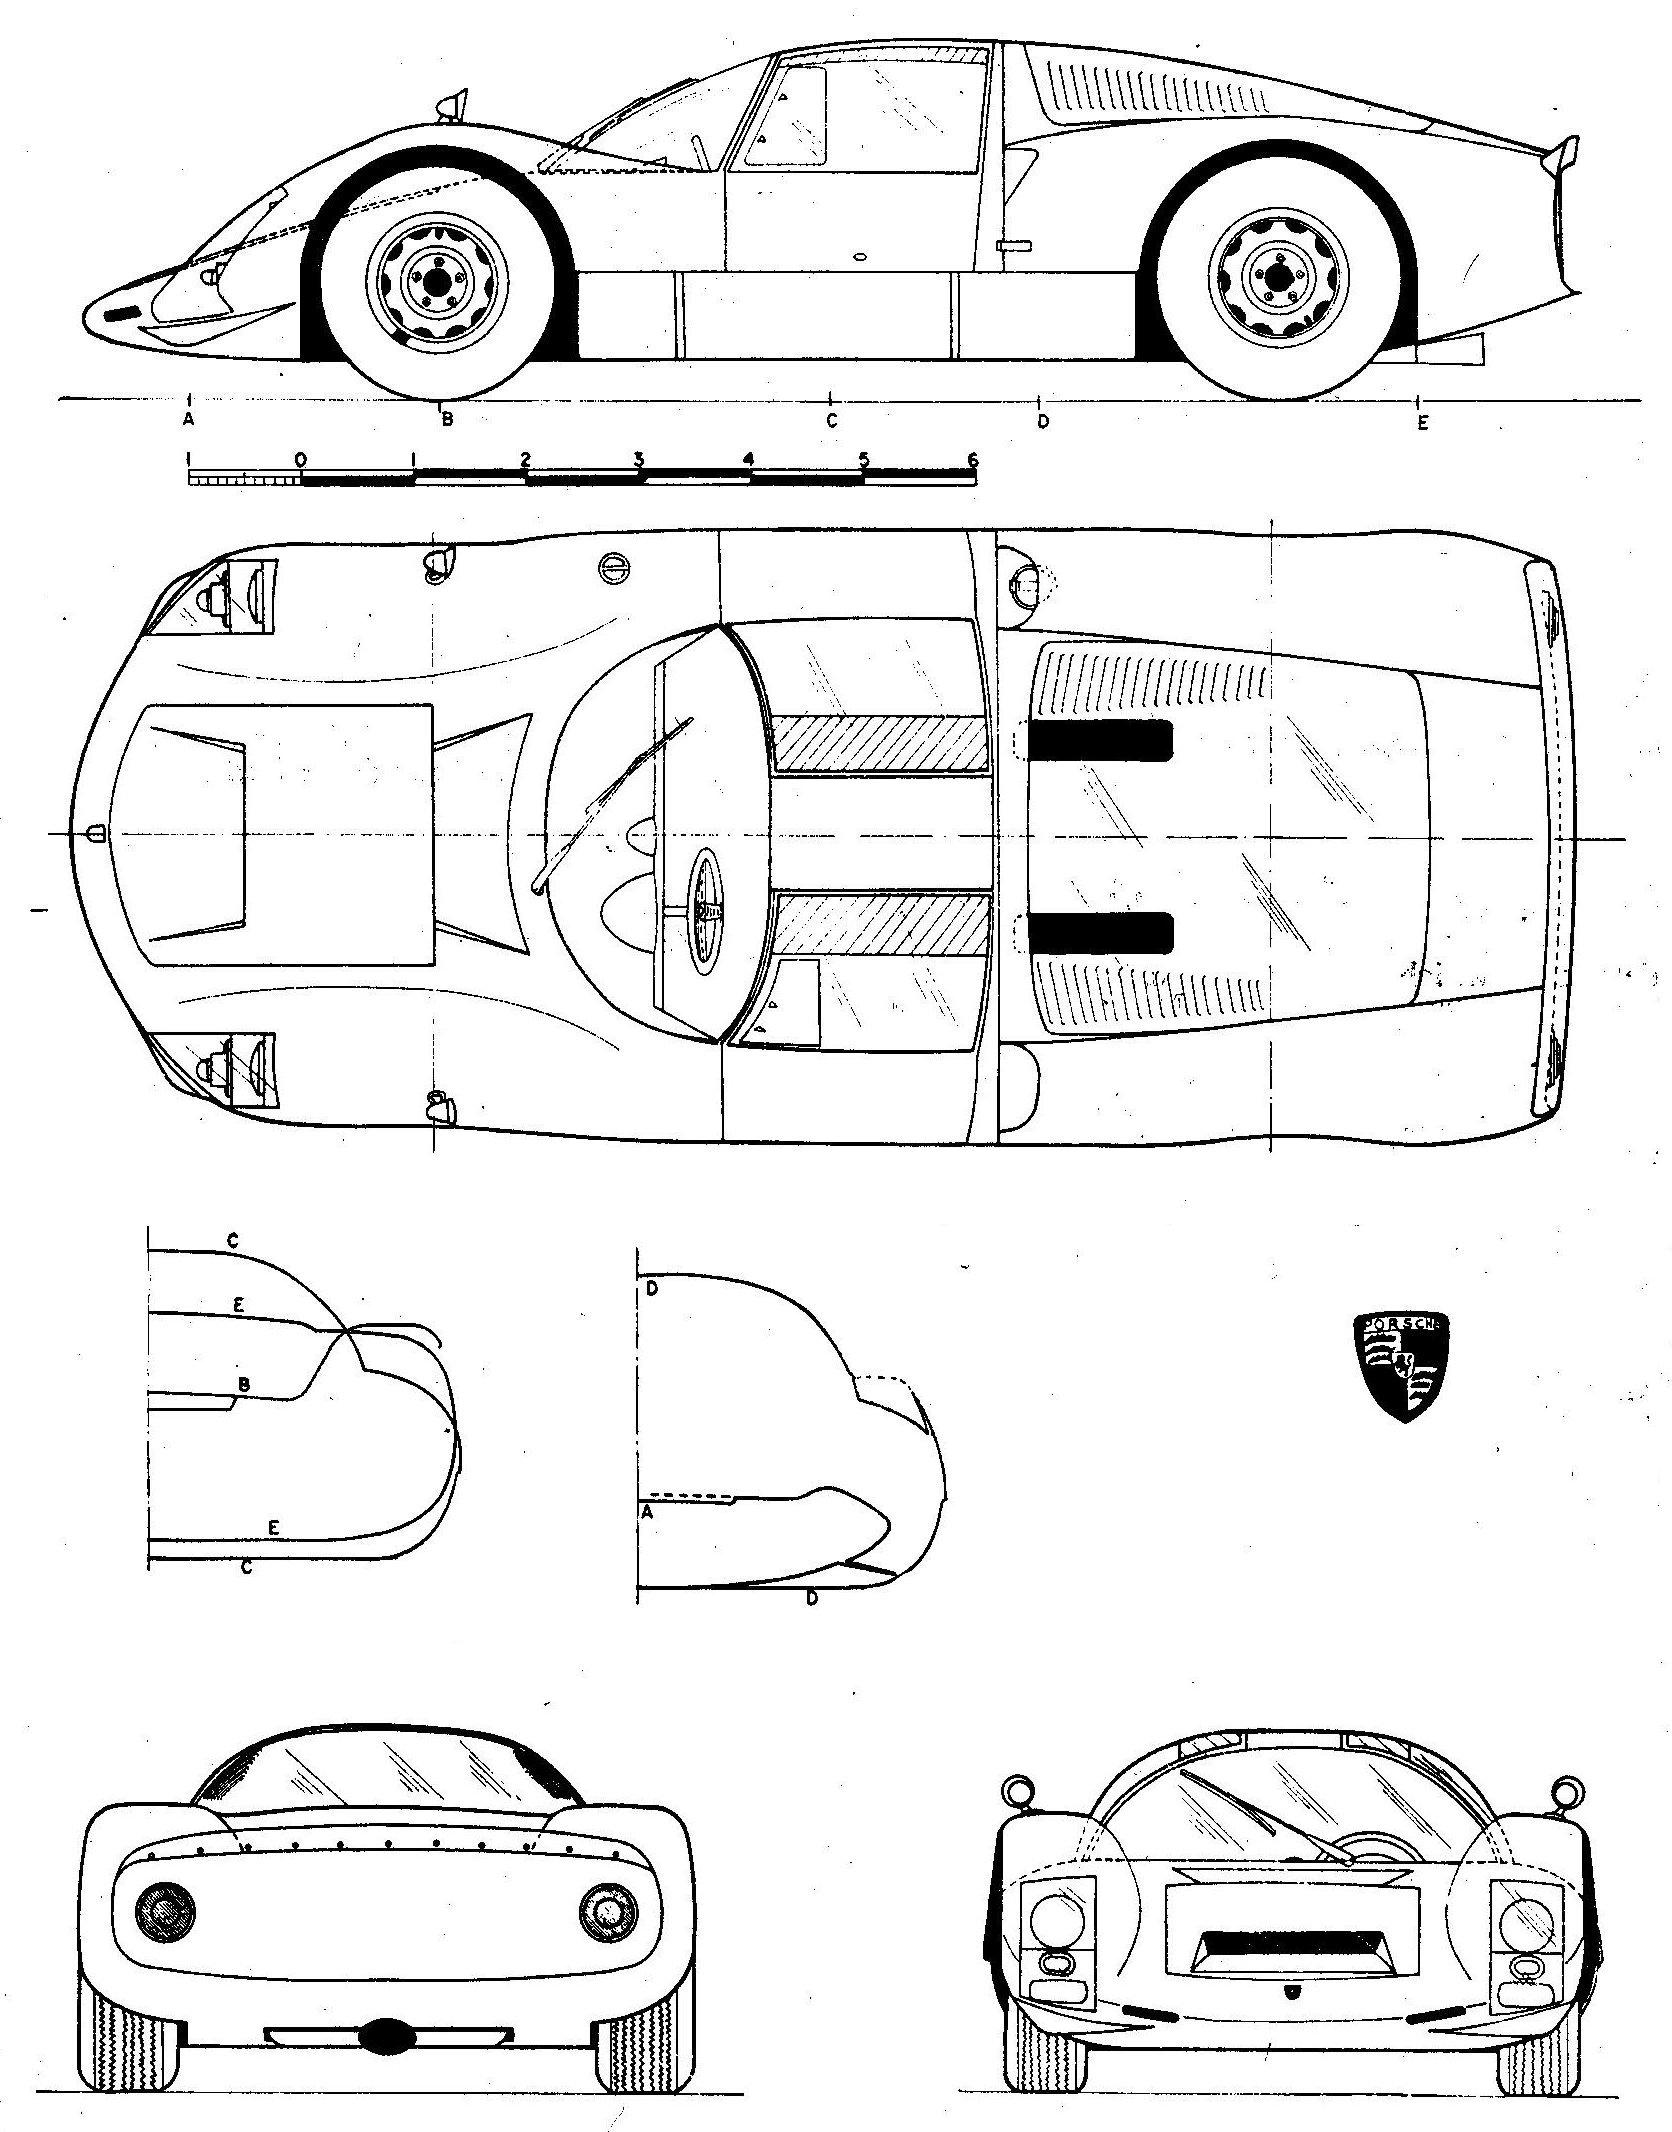 V12 Engine Design Diagram